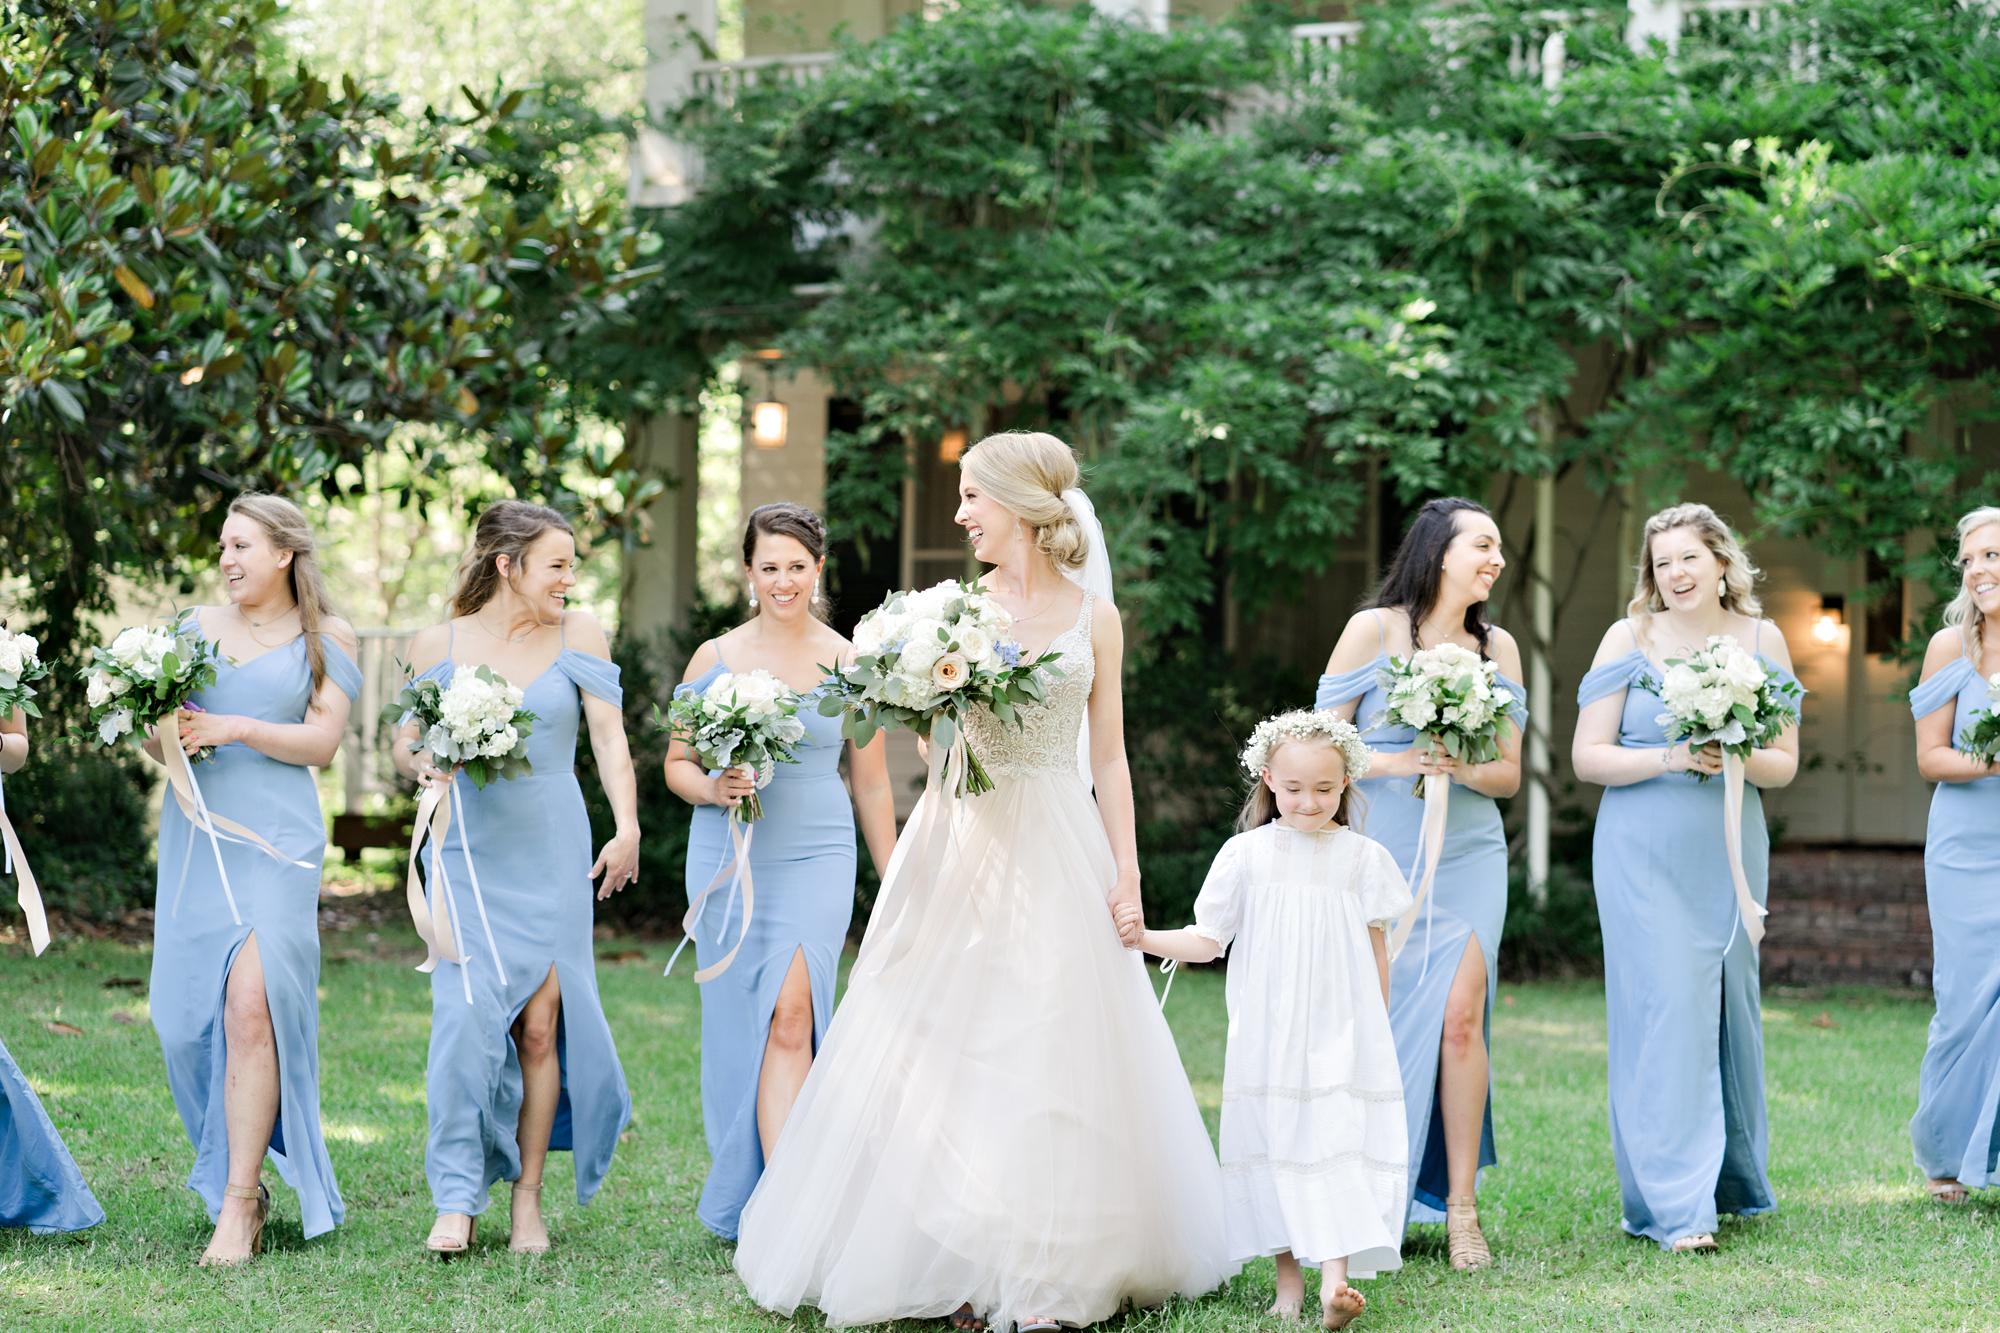 Alabama-Photographers-Nick-Drollette-Wedding-Photography-125.jpg